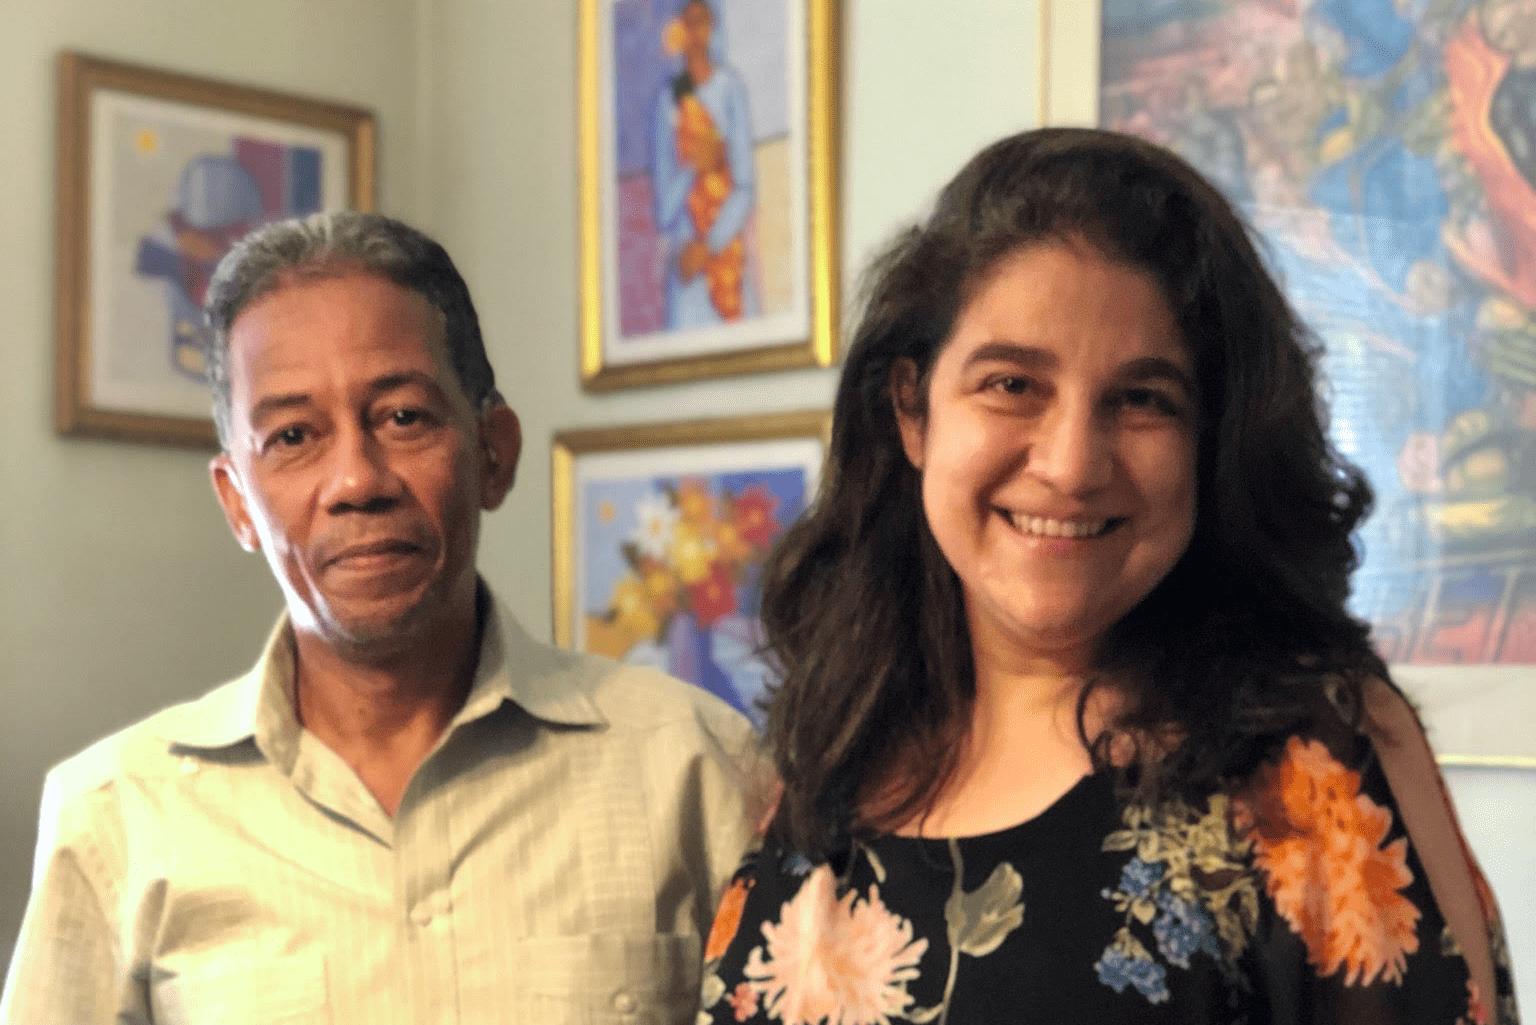 Angela Fernandez with Juan Villar, Principal of High School for Media and Communications